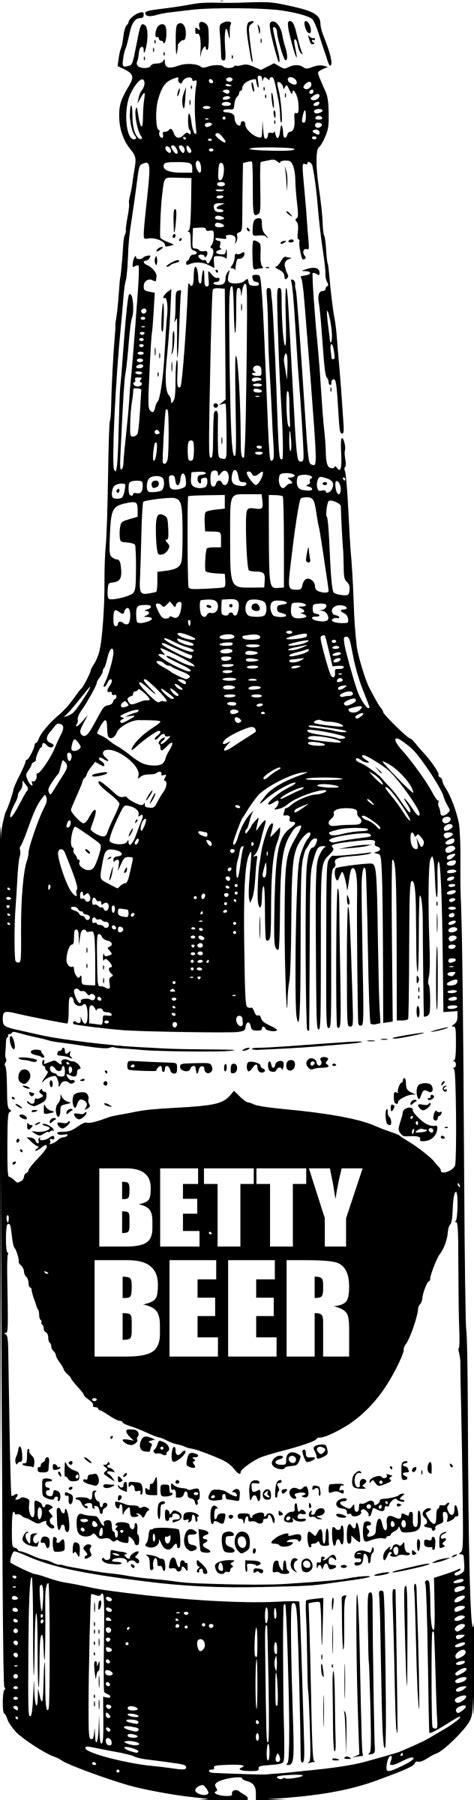 image of beer bottle clipart 4446 beer drawing clipartoons clipart beer bottle